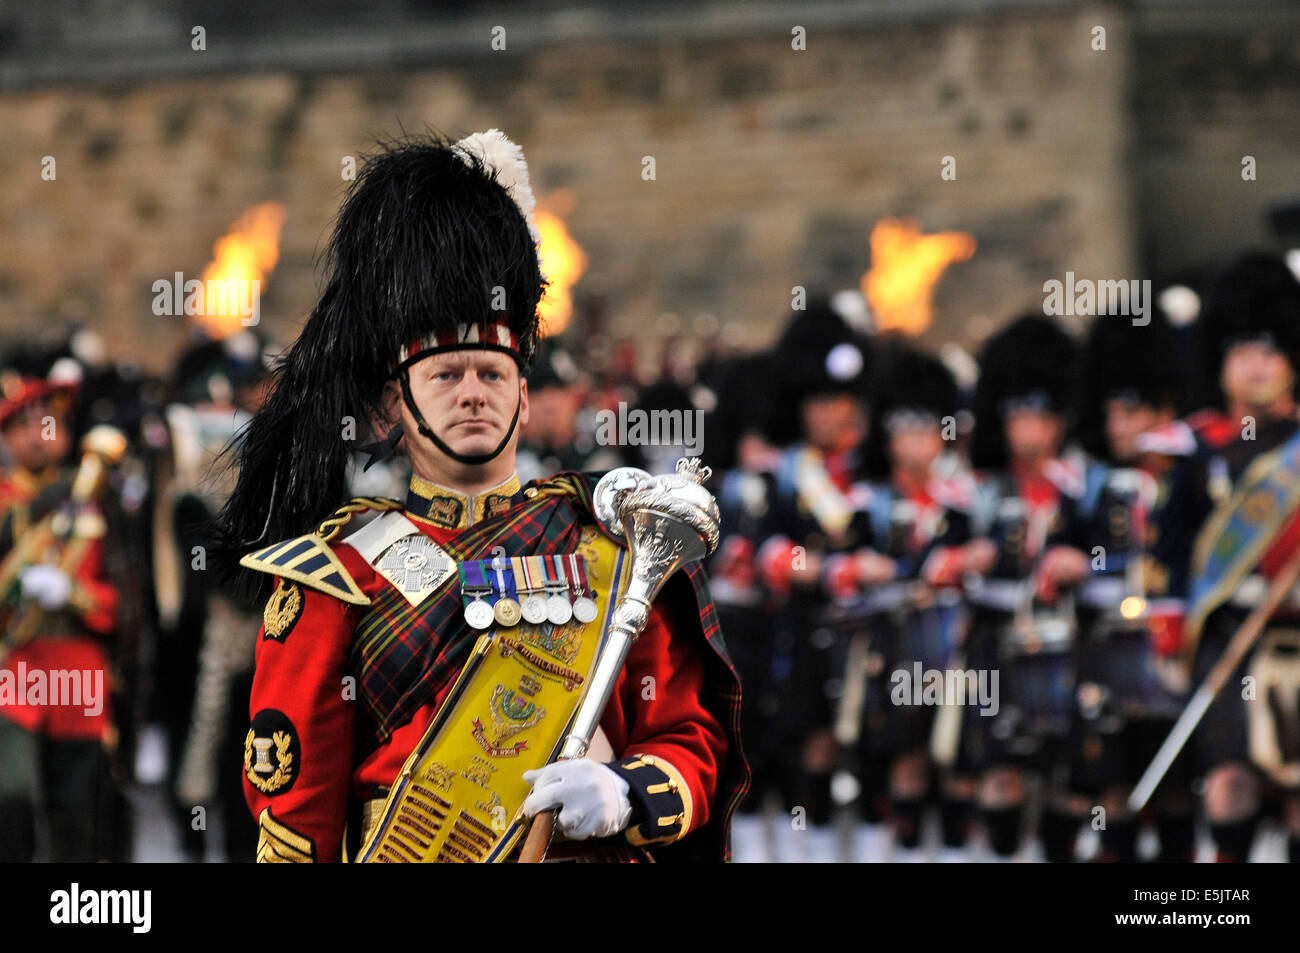 Edinburgh, Ecosse, Royaume-Uni. 2 août 2014. Le Royal Edinburgh Military Tattoo a lieu sur l'esplanade Photo Stock